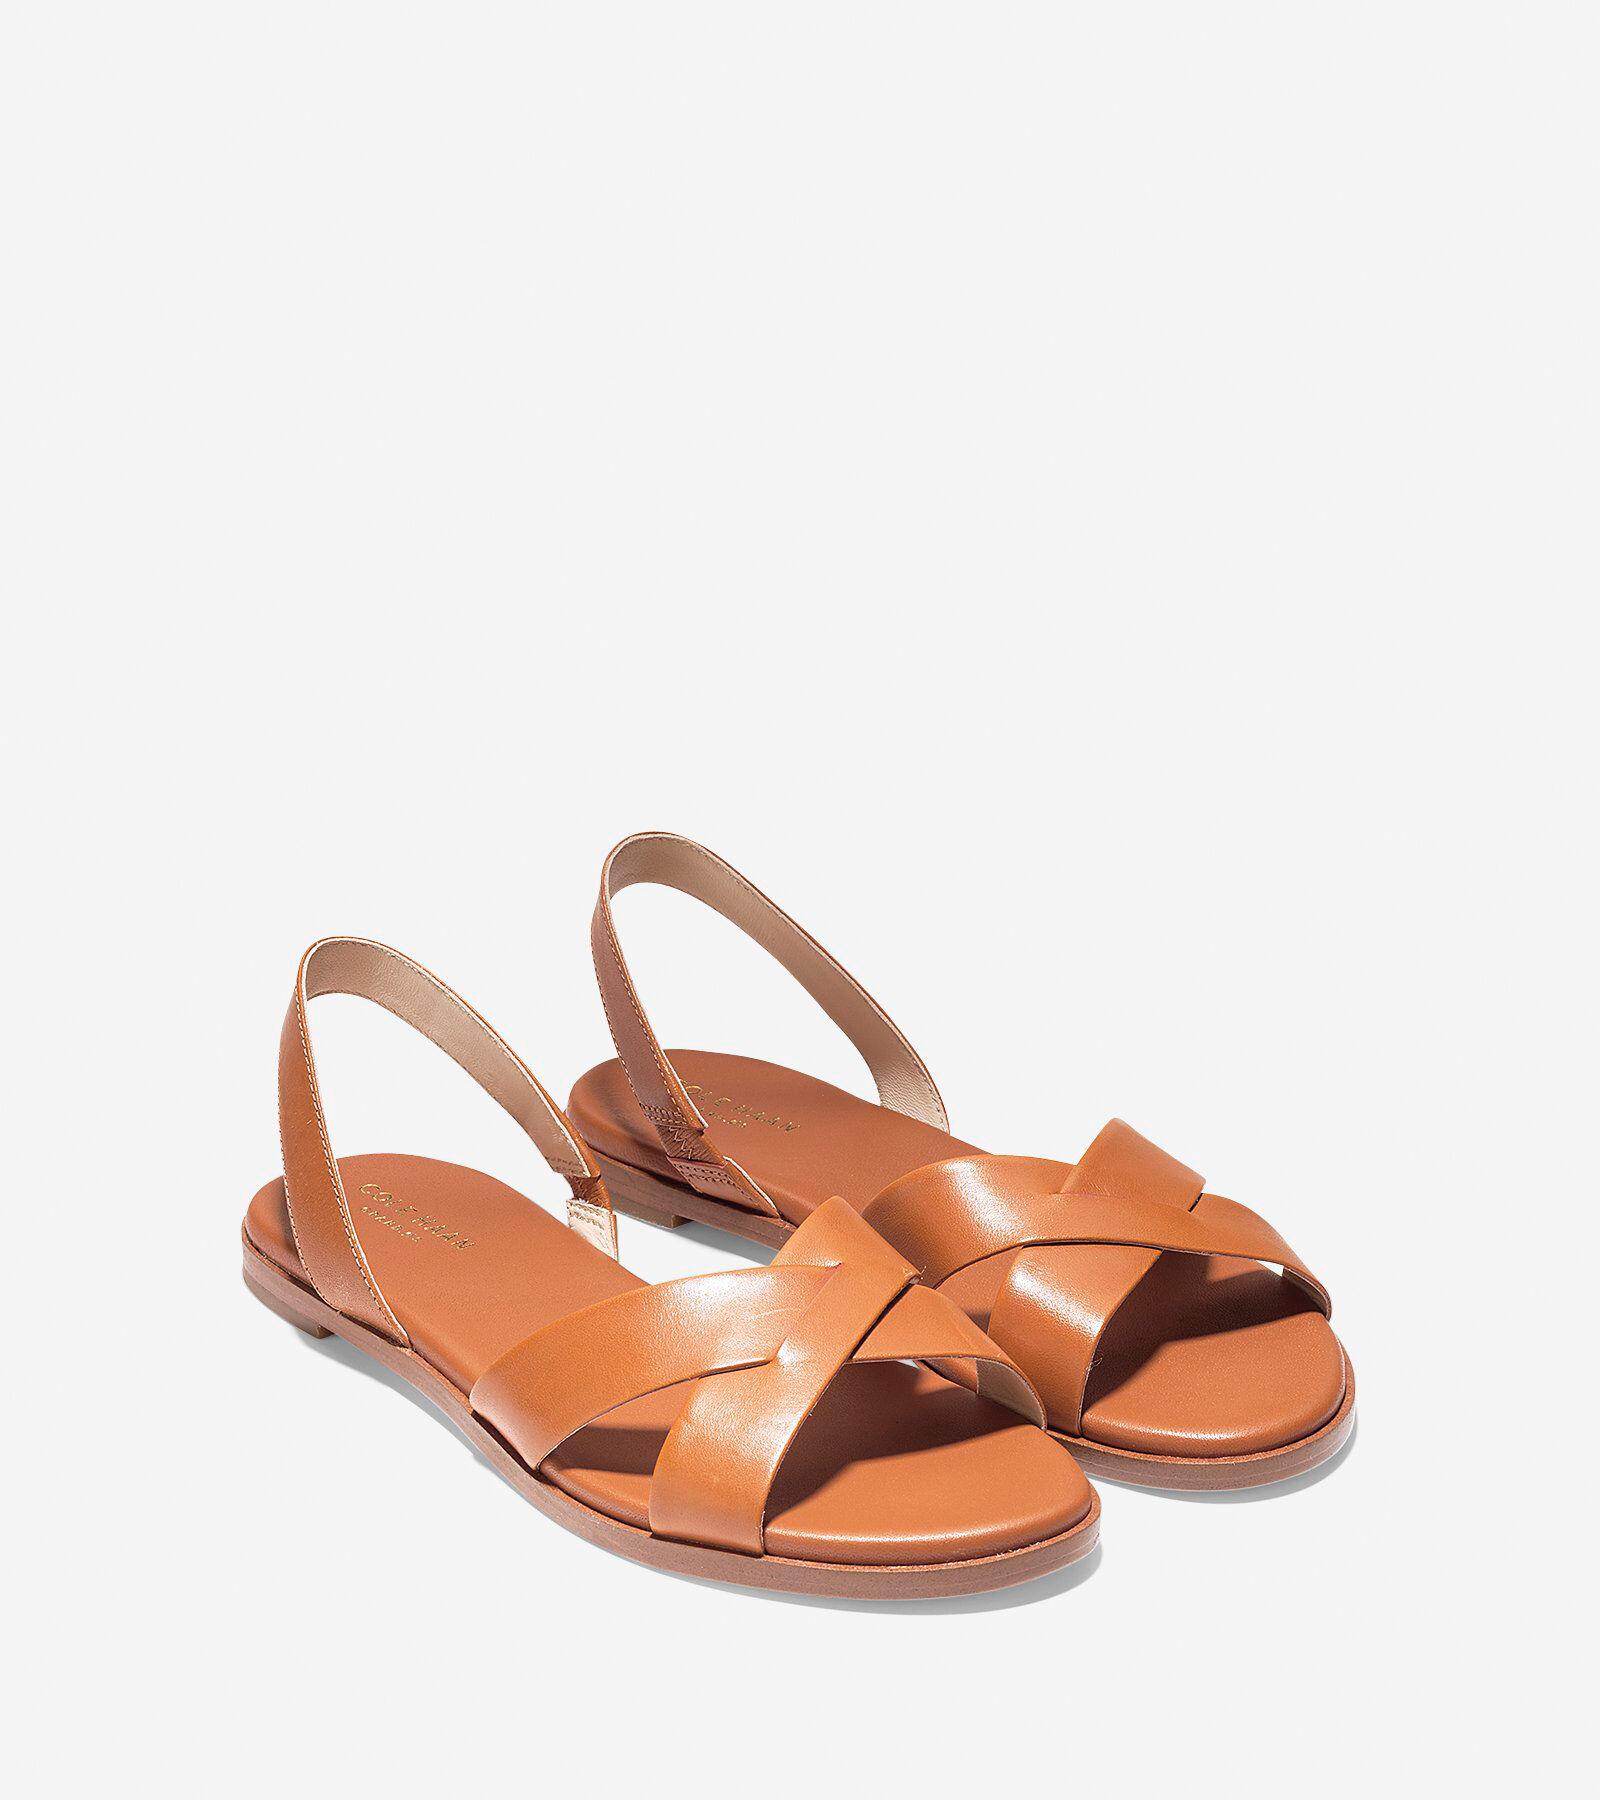 Cole HaanAnica Sandal